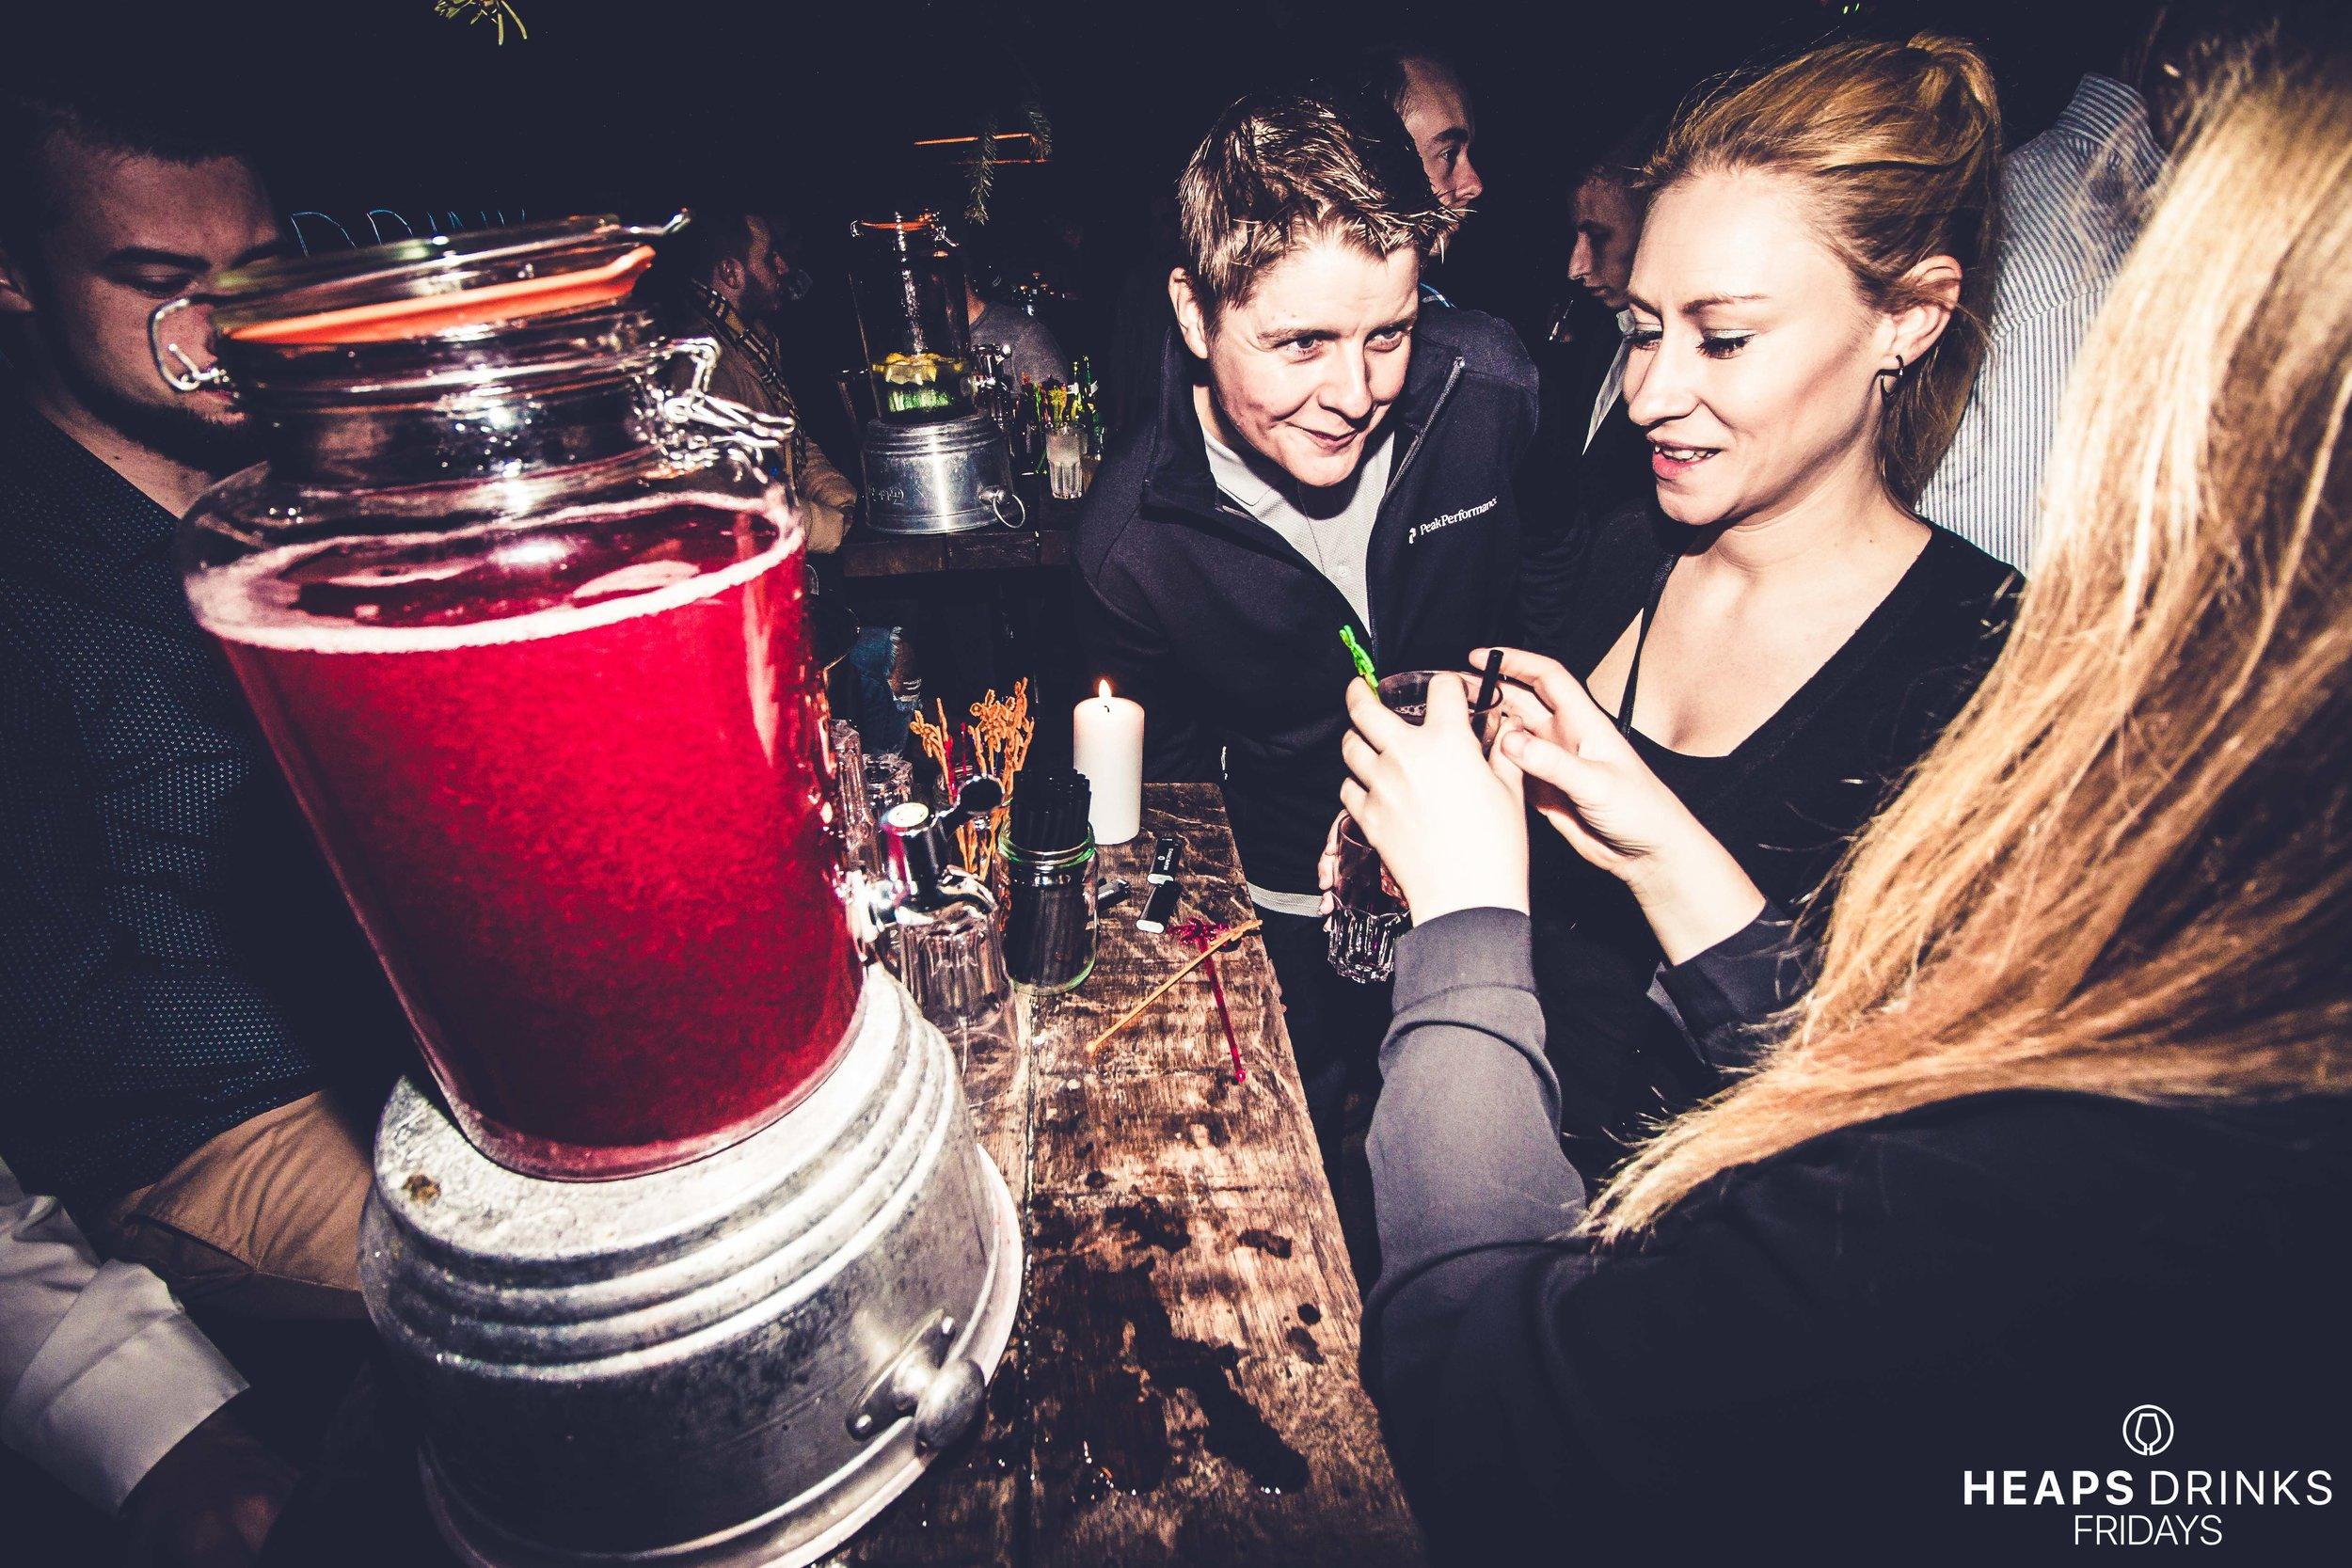 Heaps_drinks_7.jpg